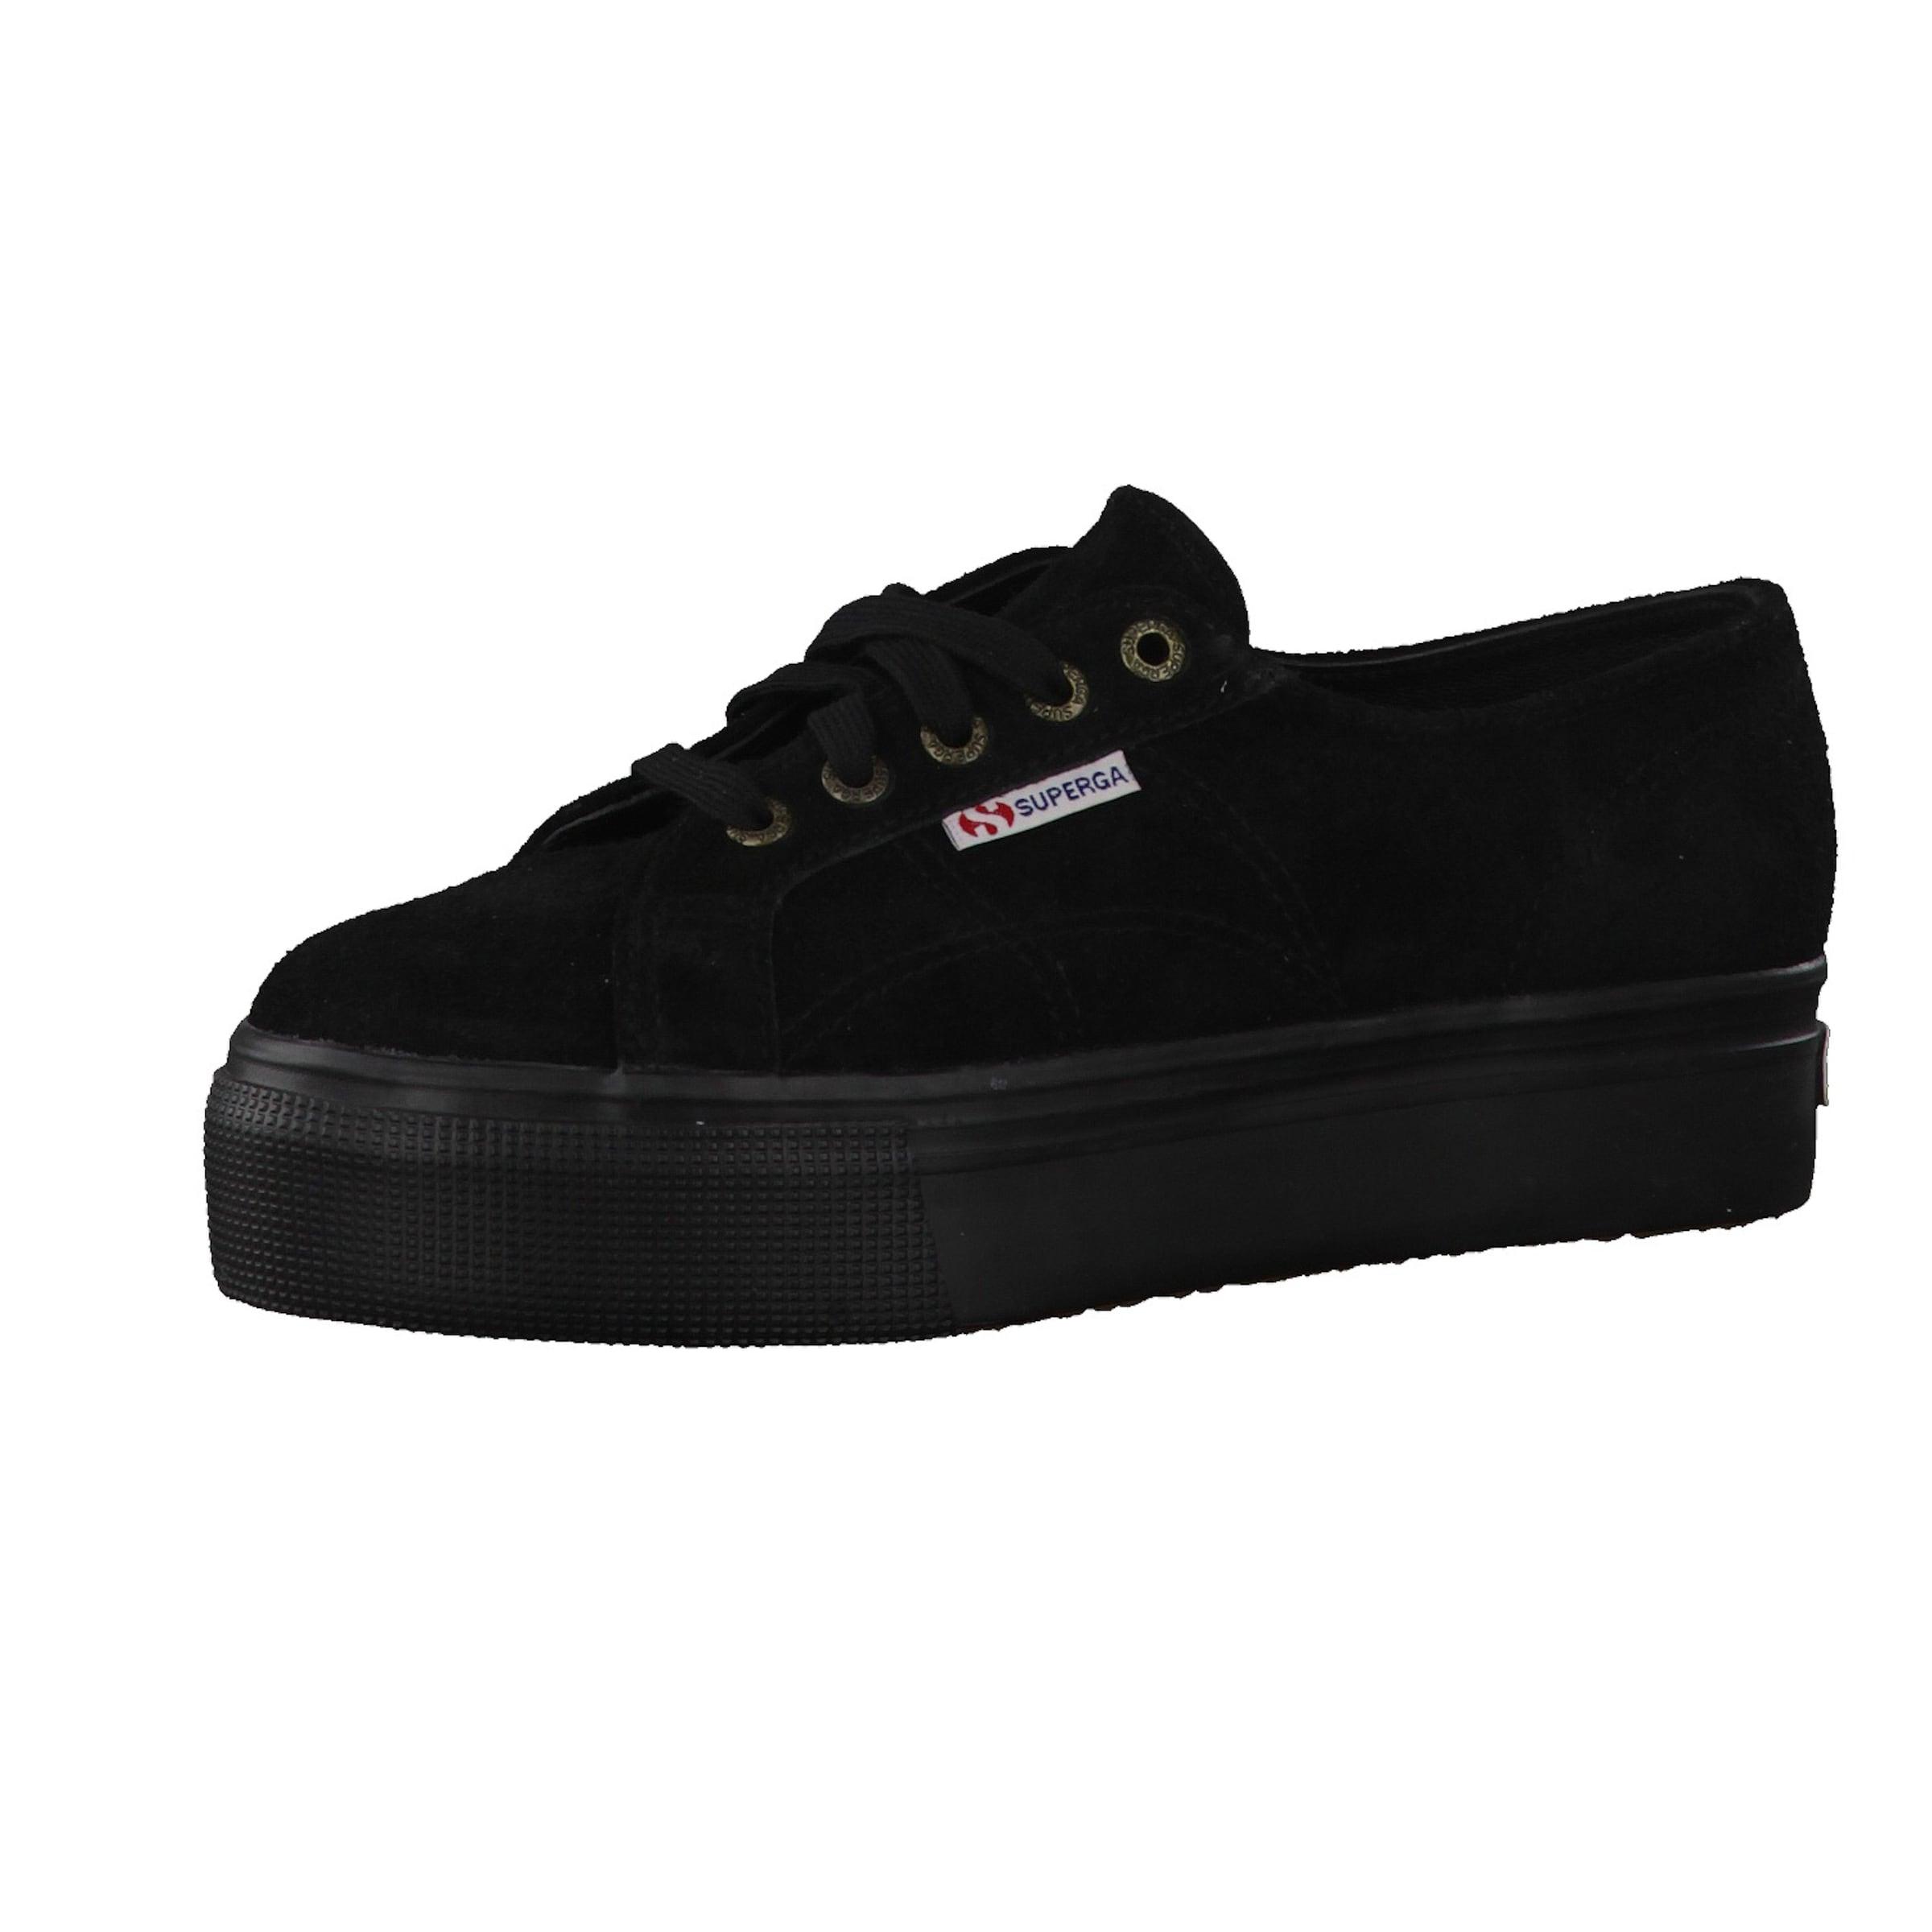 SUPERGA Sneaker 2790 SUEW S003LM0-A09 Hohe Qualität